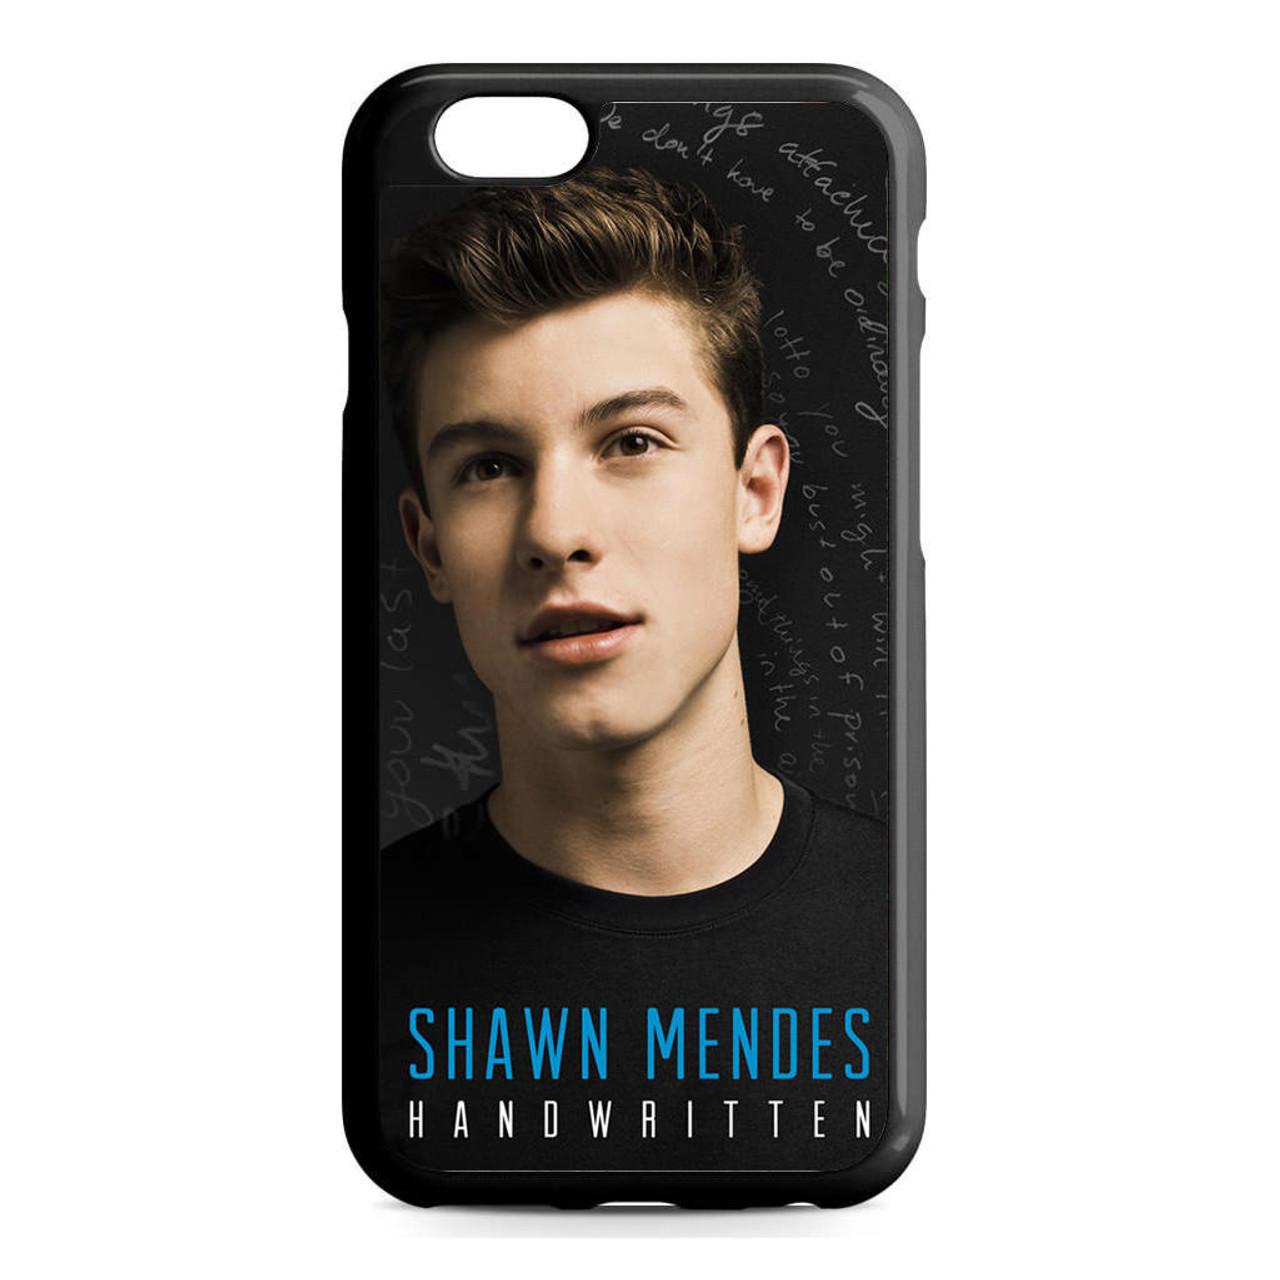 hot sale online 57dd6 987dc Shawn Mendes iPhone 6/6S Case